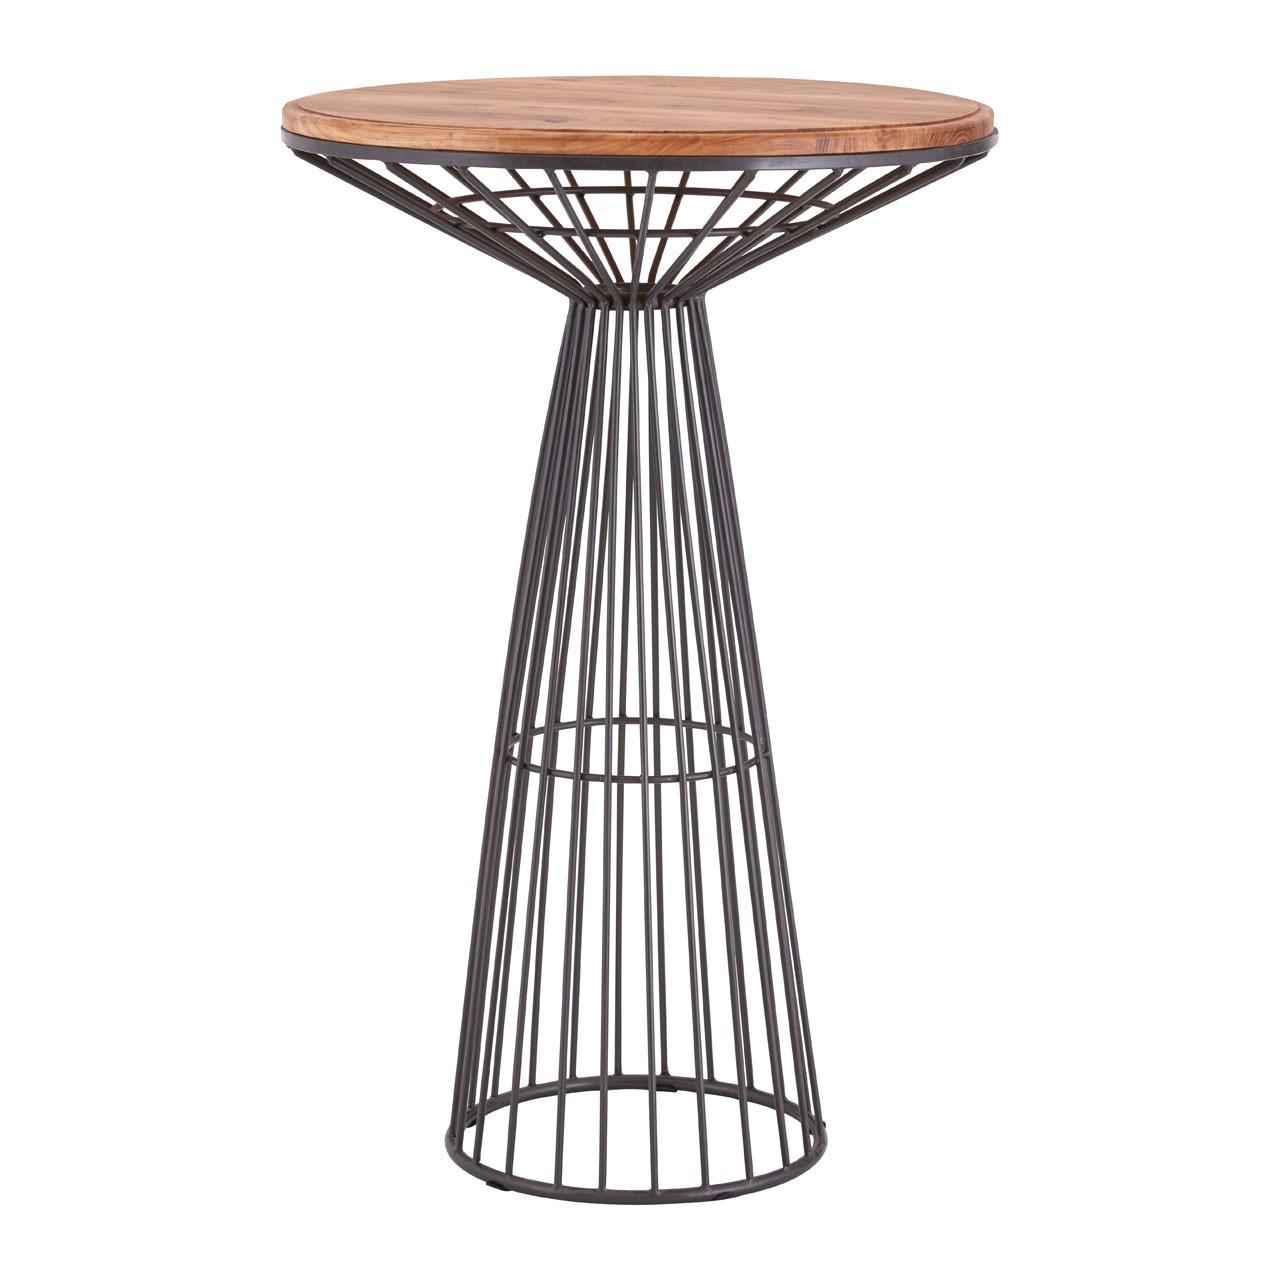 Foundry Circular Bar Table